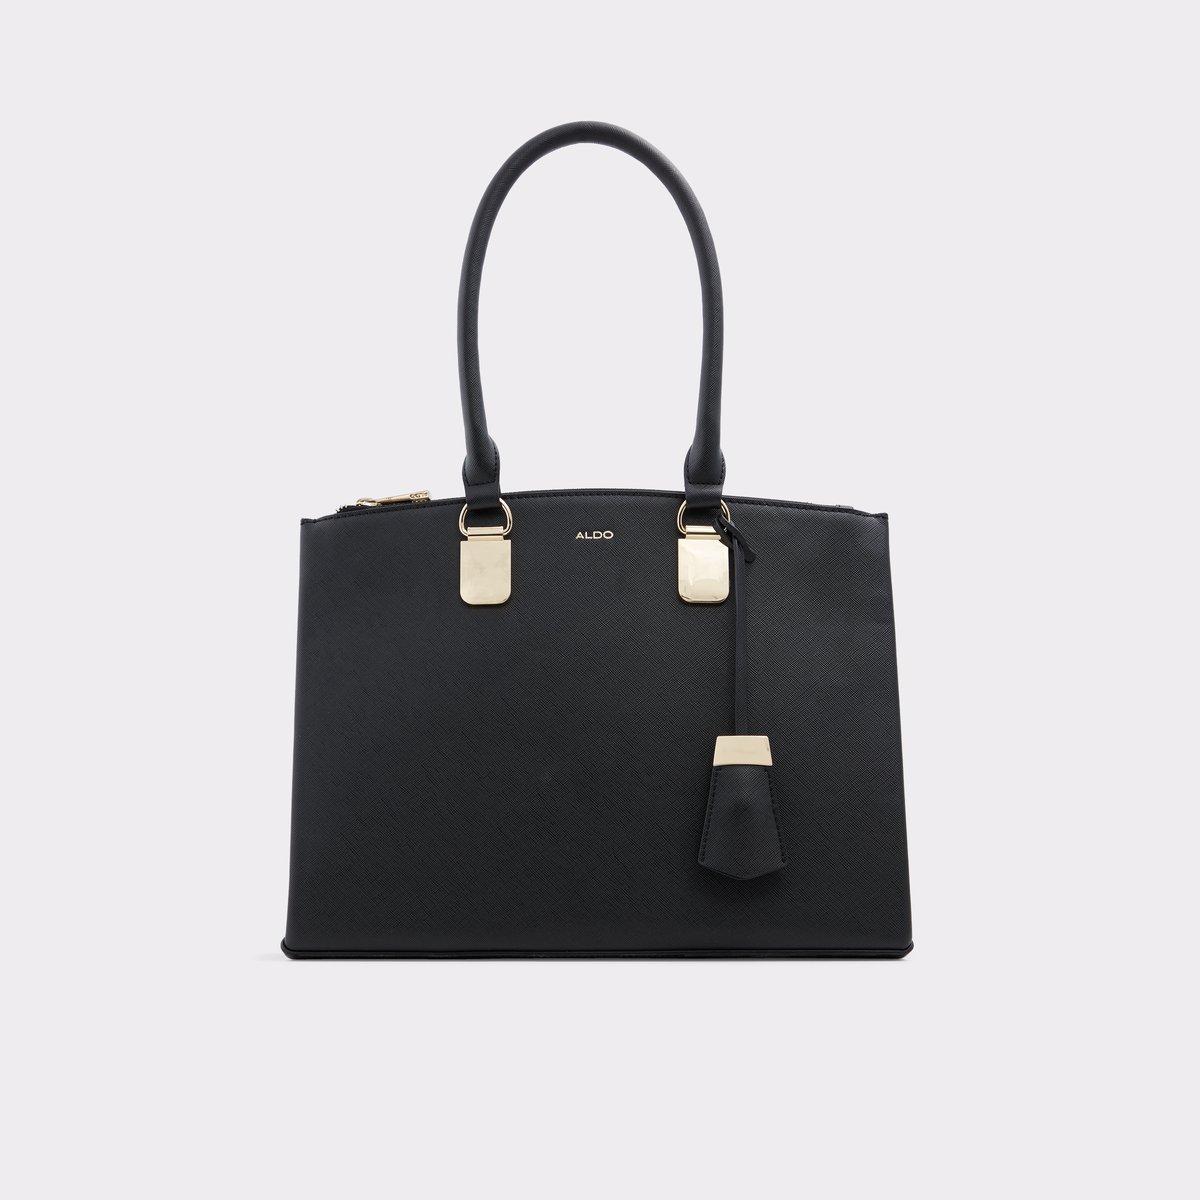 Hafsia Black Women's Tote Bags   ALDO US